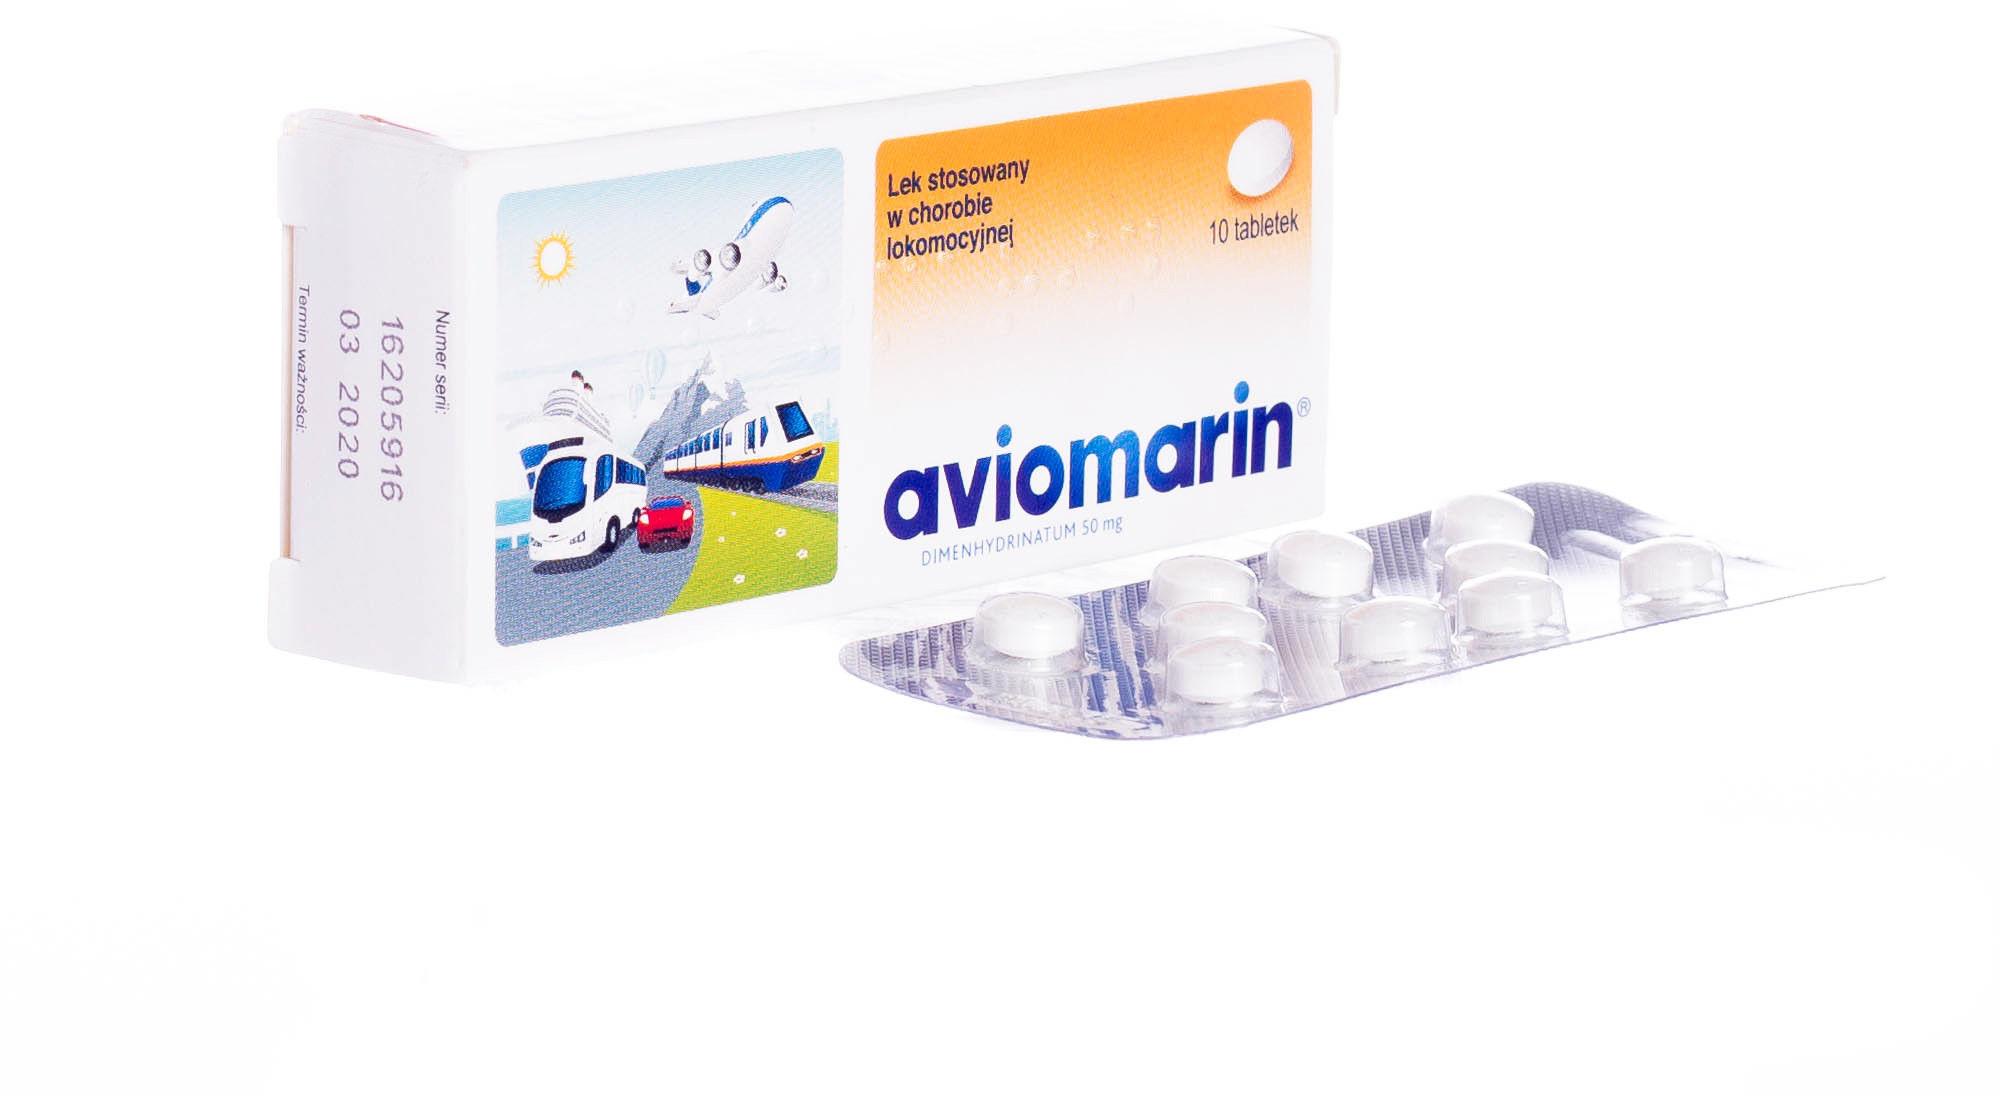 Aviomarin lek stosowany w chorobie lokomocyjnej, 10 tabletek